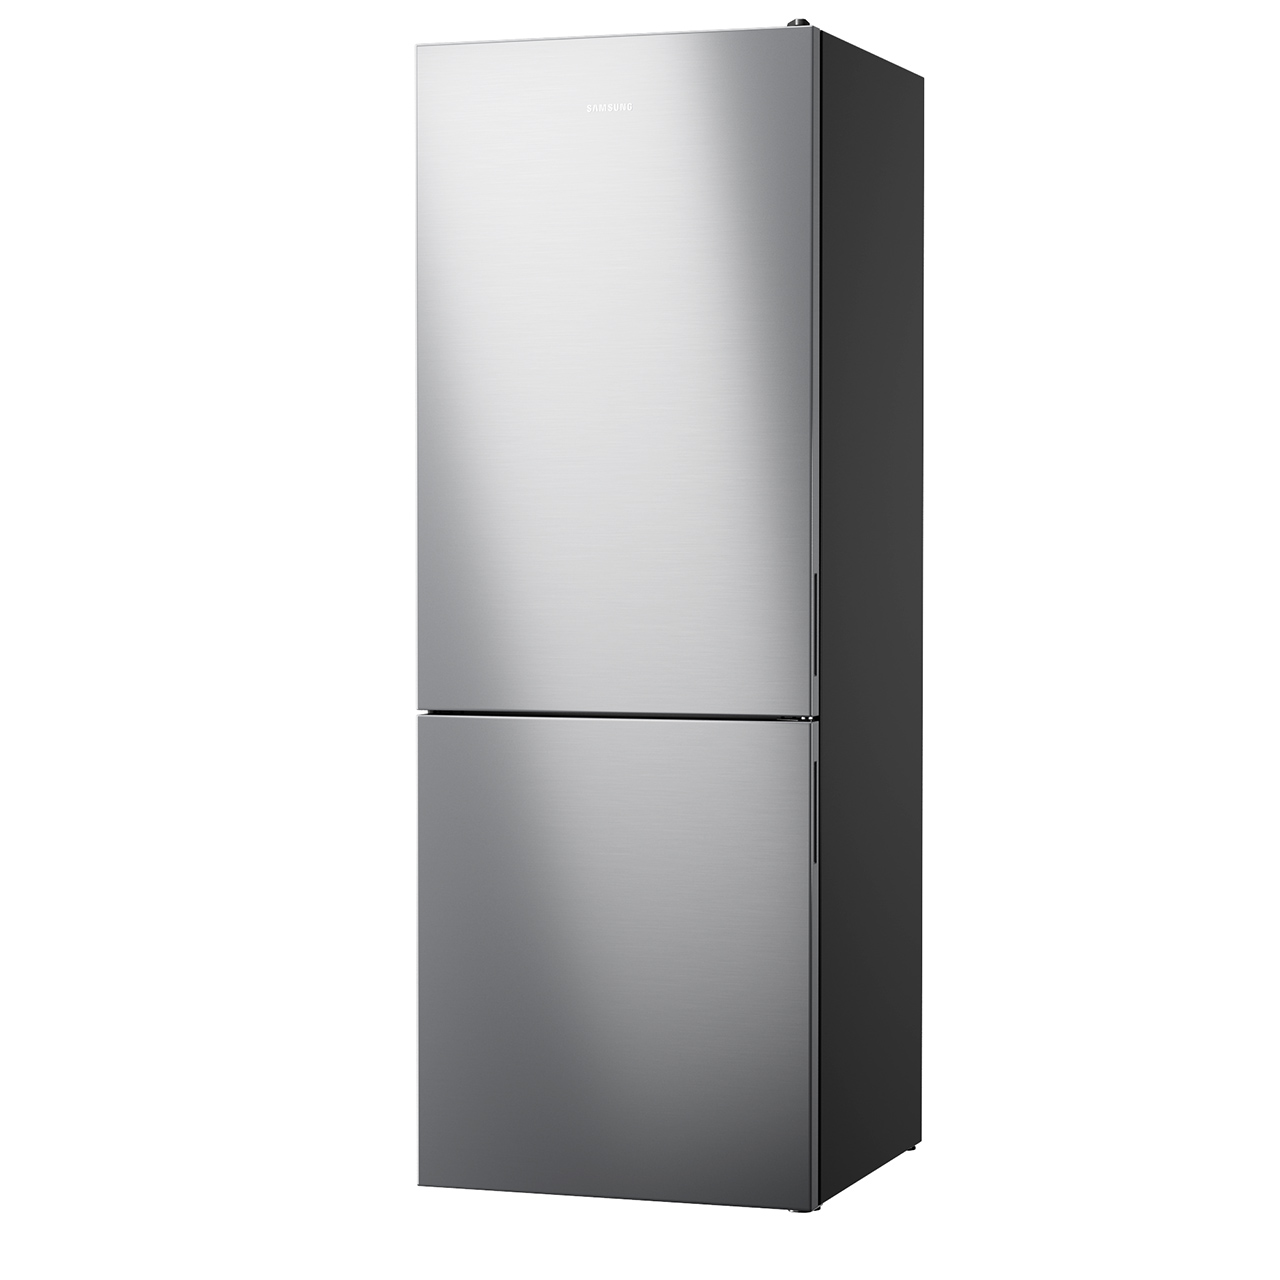 RB46 Fridge Freezer 192 cm by Samsung